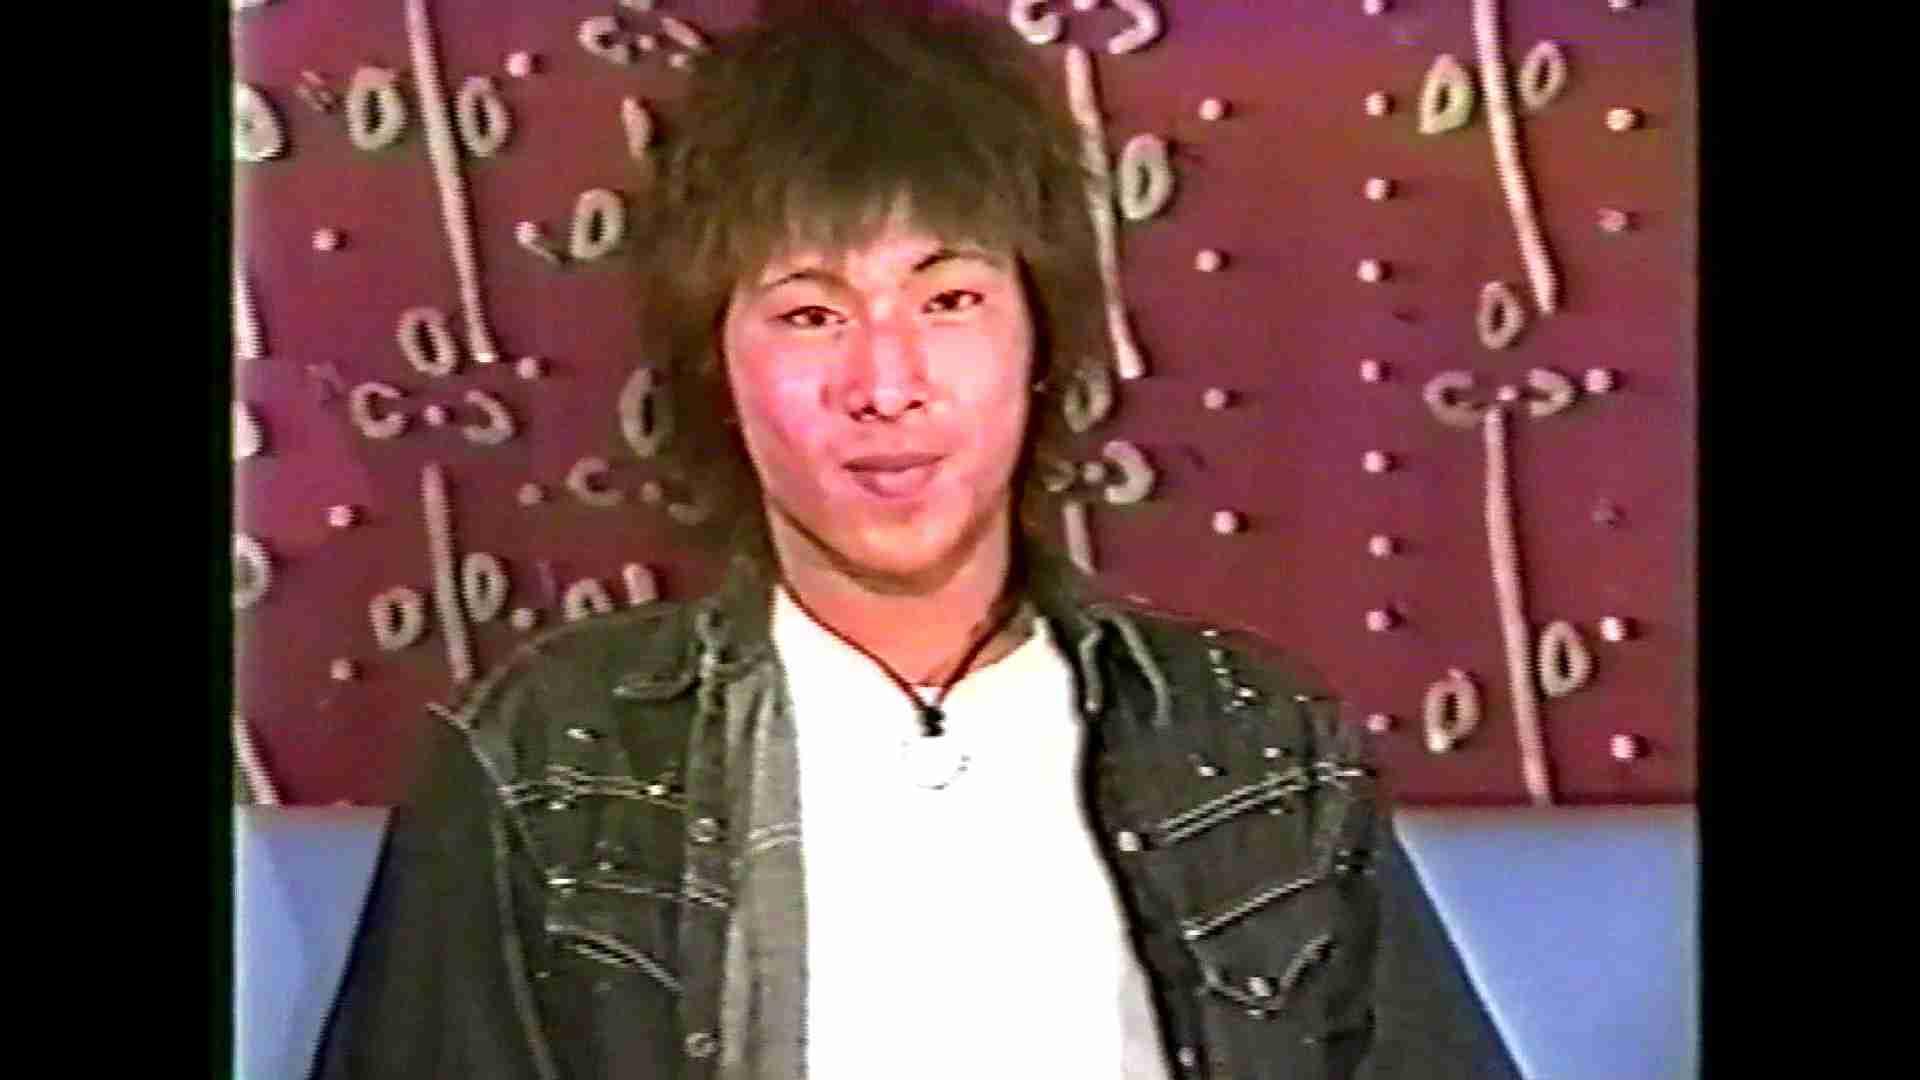 GAYBOY宏のオカズ倉庫Vol.3-1 GAY ゲイセックス画像 103画像 27